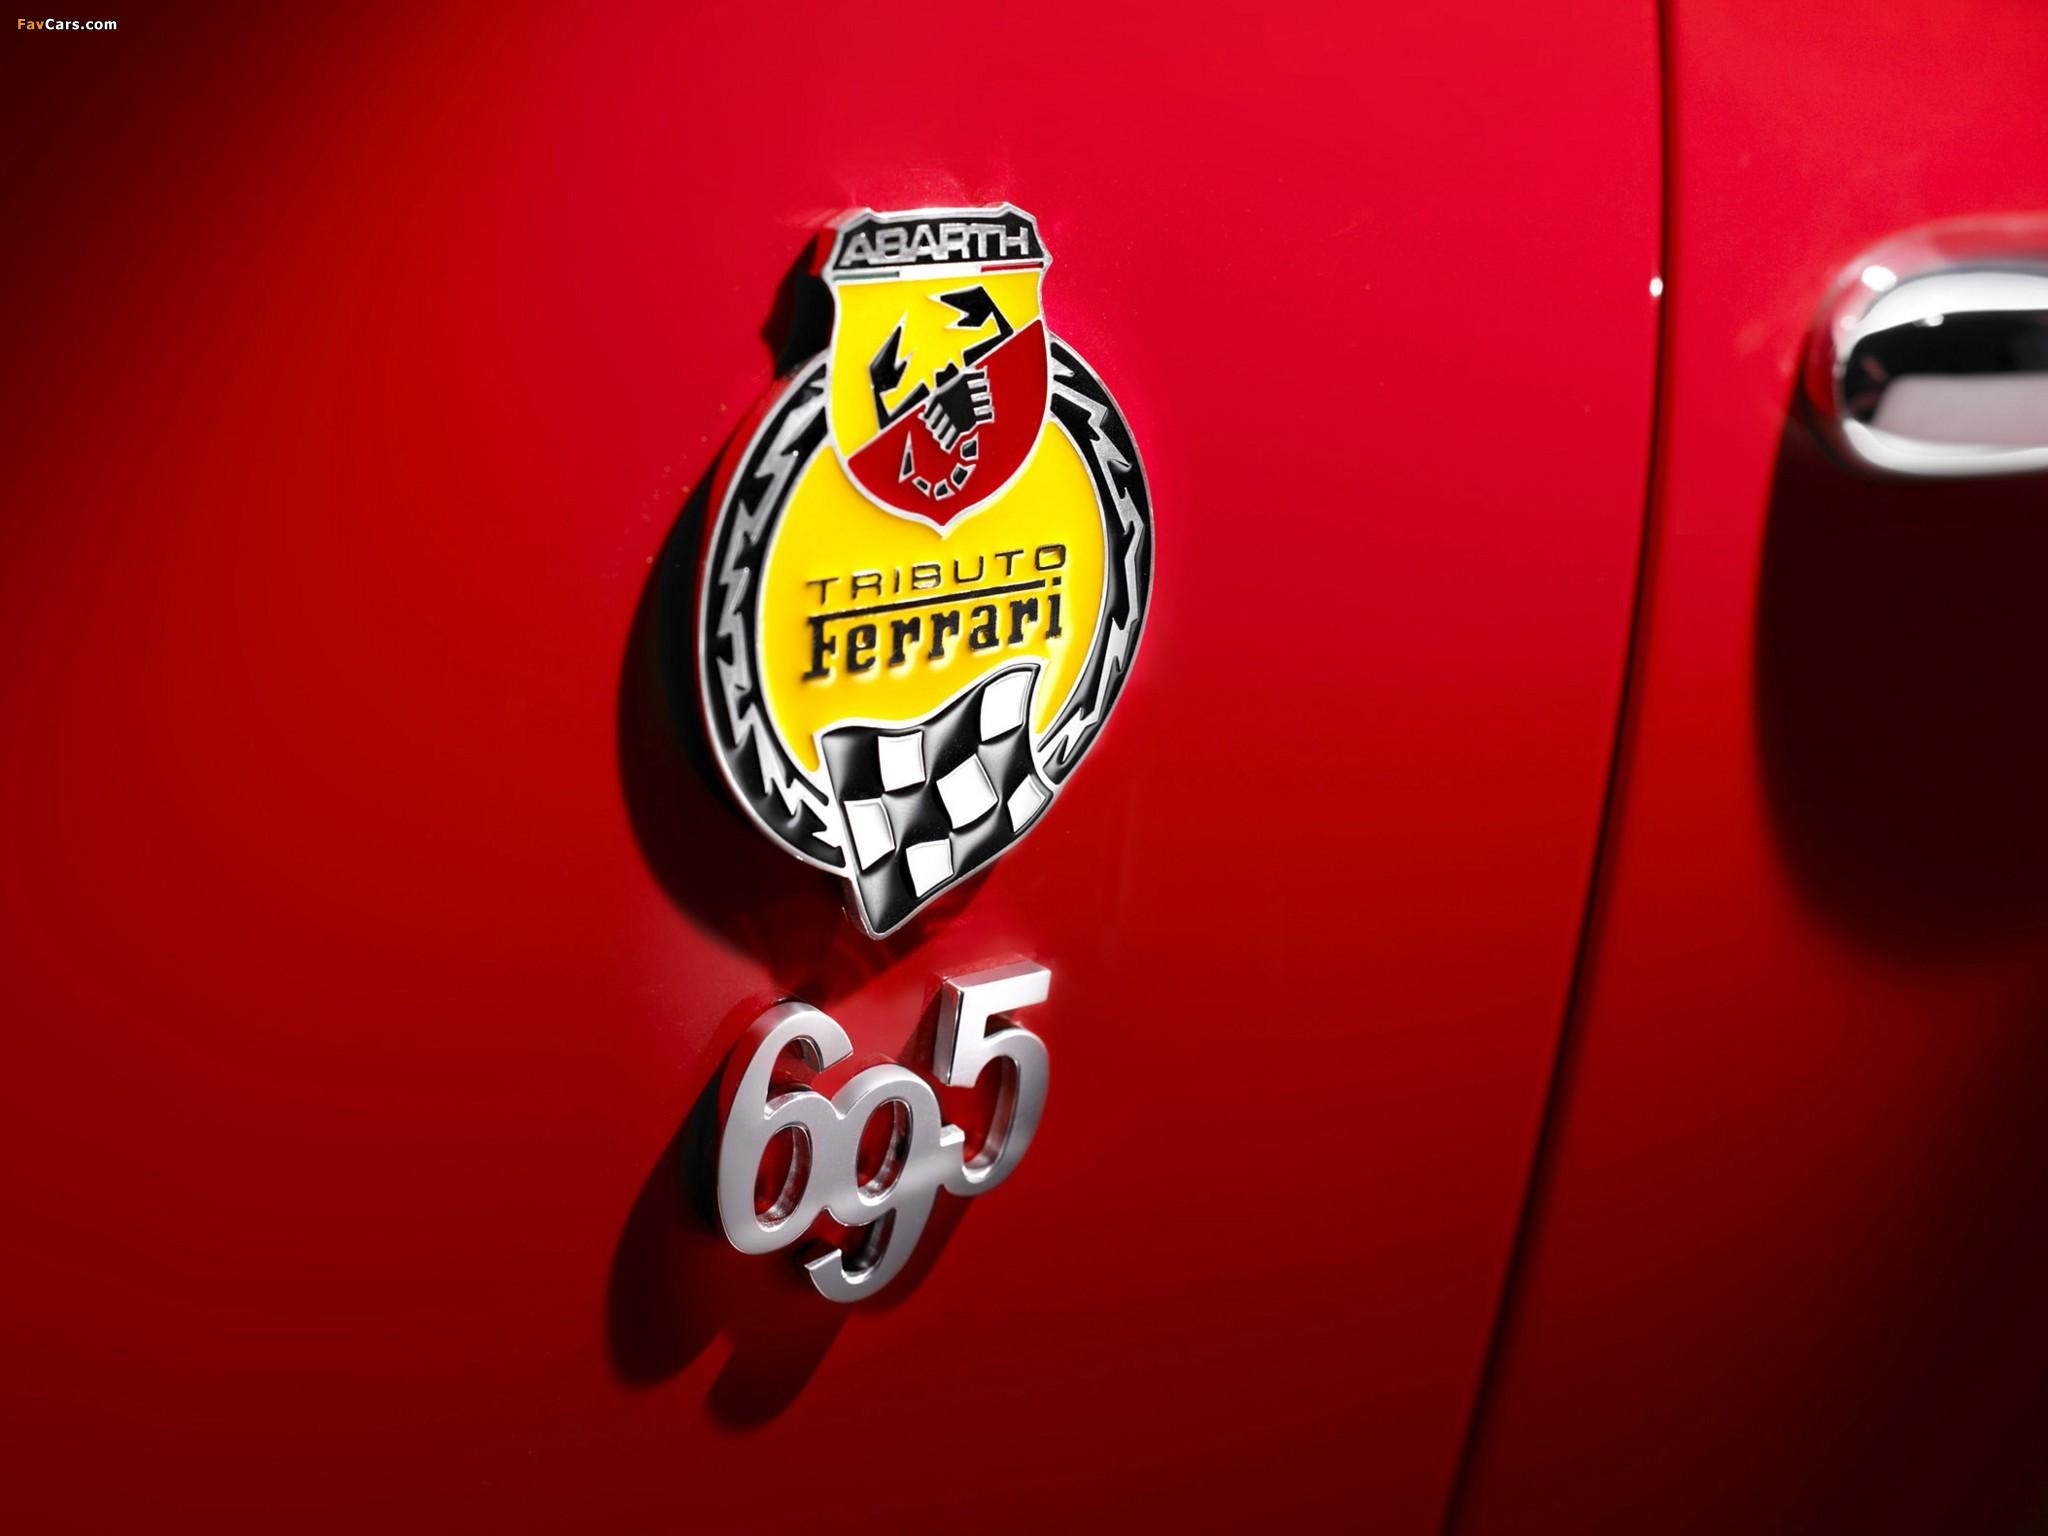 Abarth 695 Tributo Ferrari (2010) wallpapers (2048 x 1536)